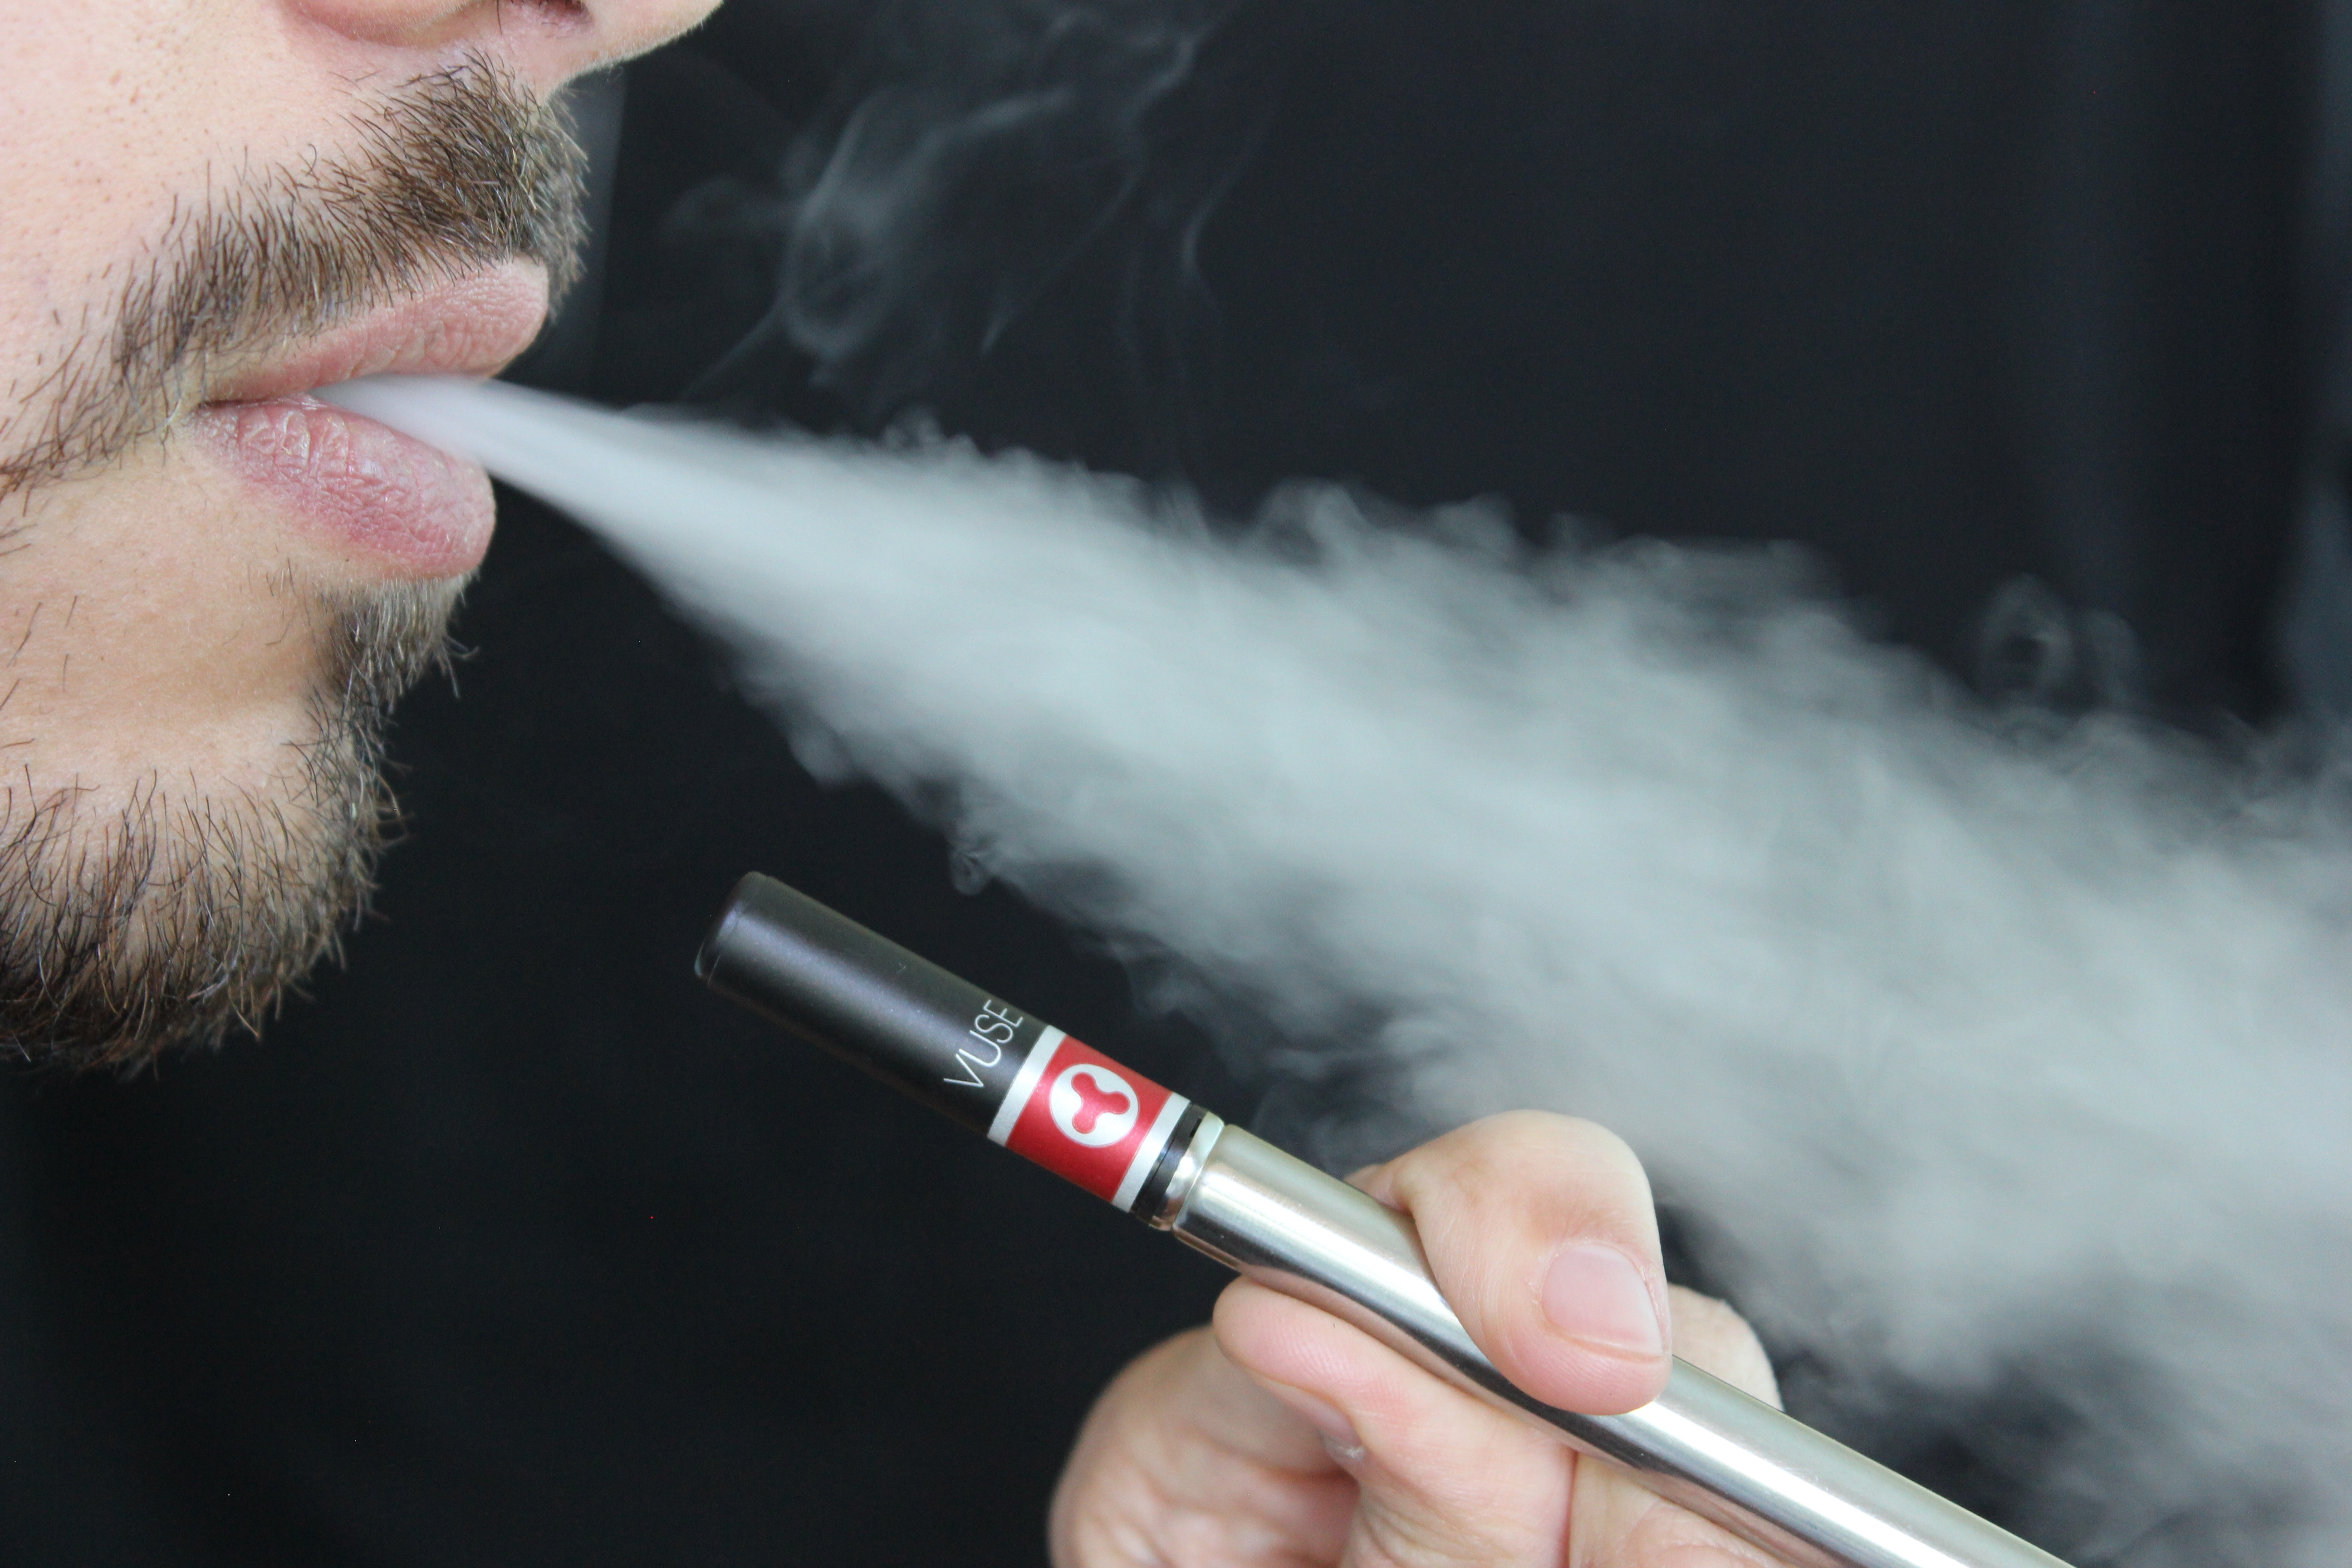 E-Cigarette Sales are Now Banned in San Francisco